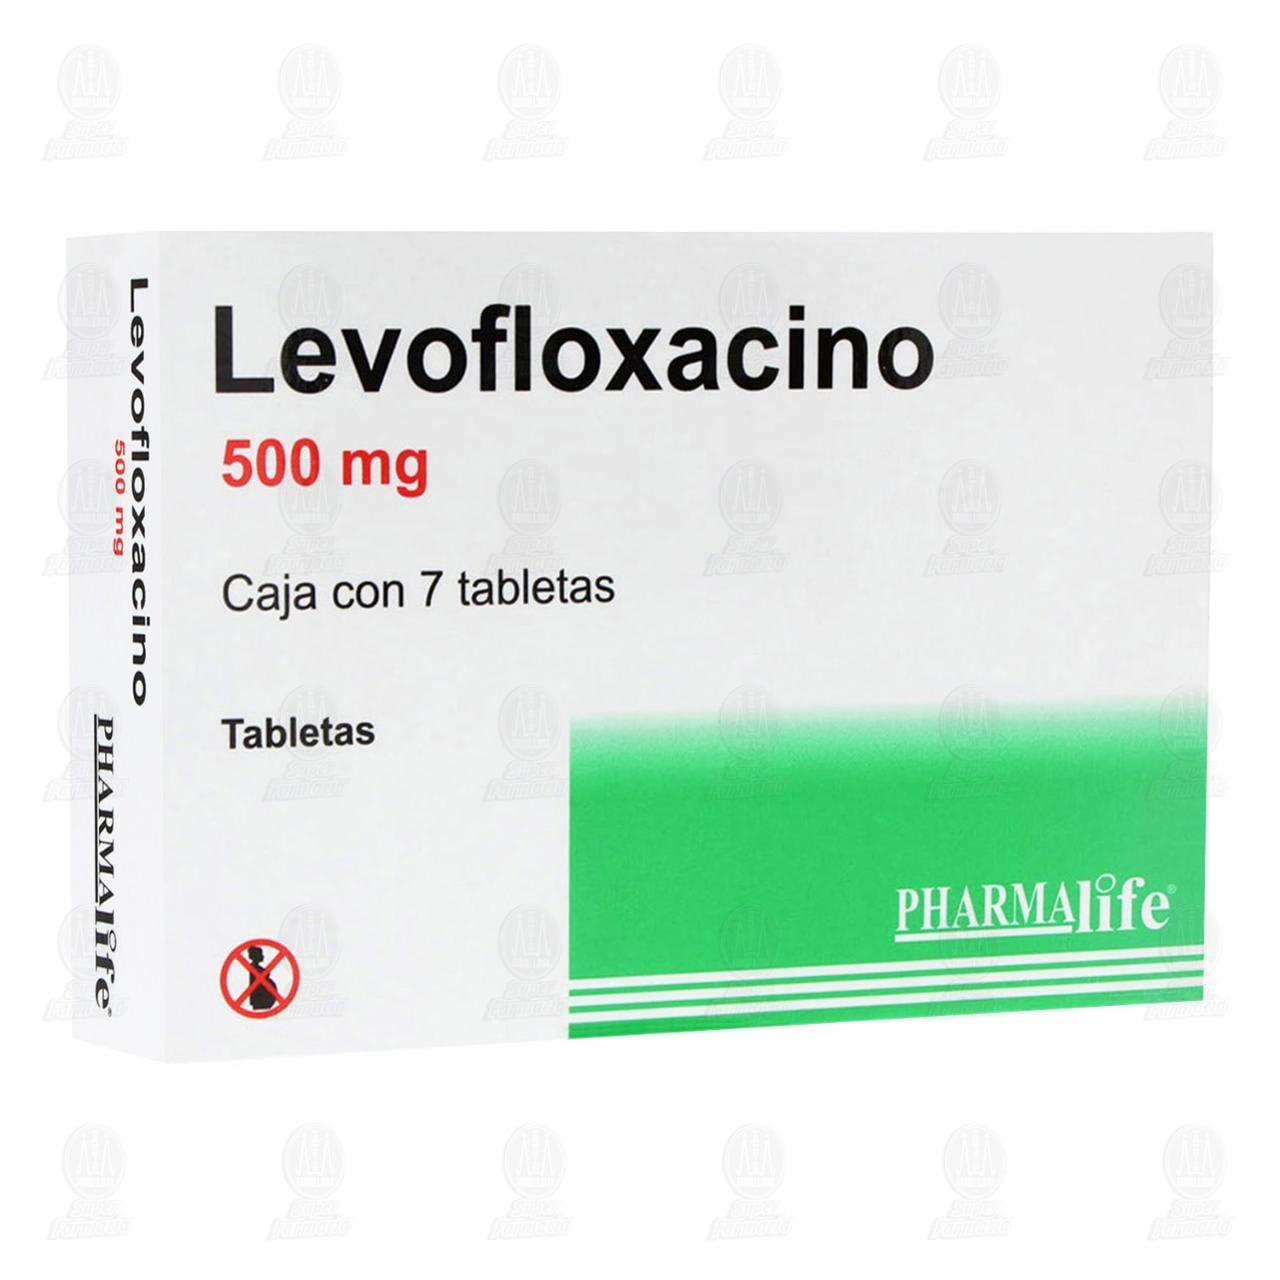 Levofloxacino 500mg 7 Tabletas Pharmalife